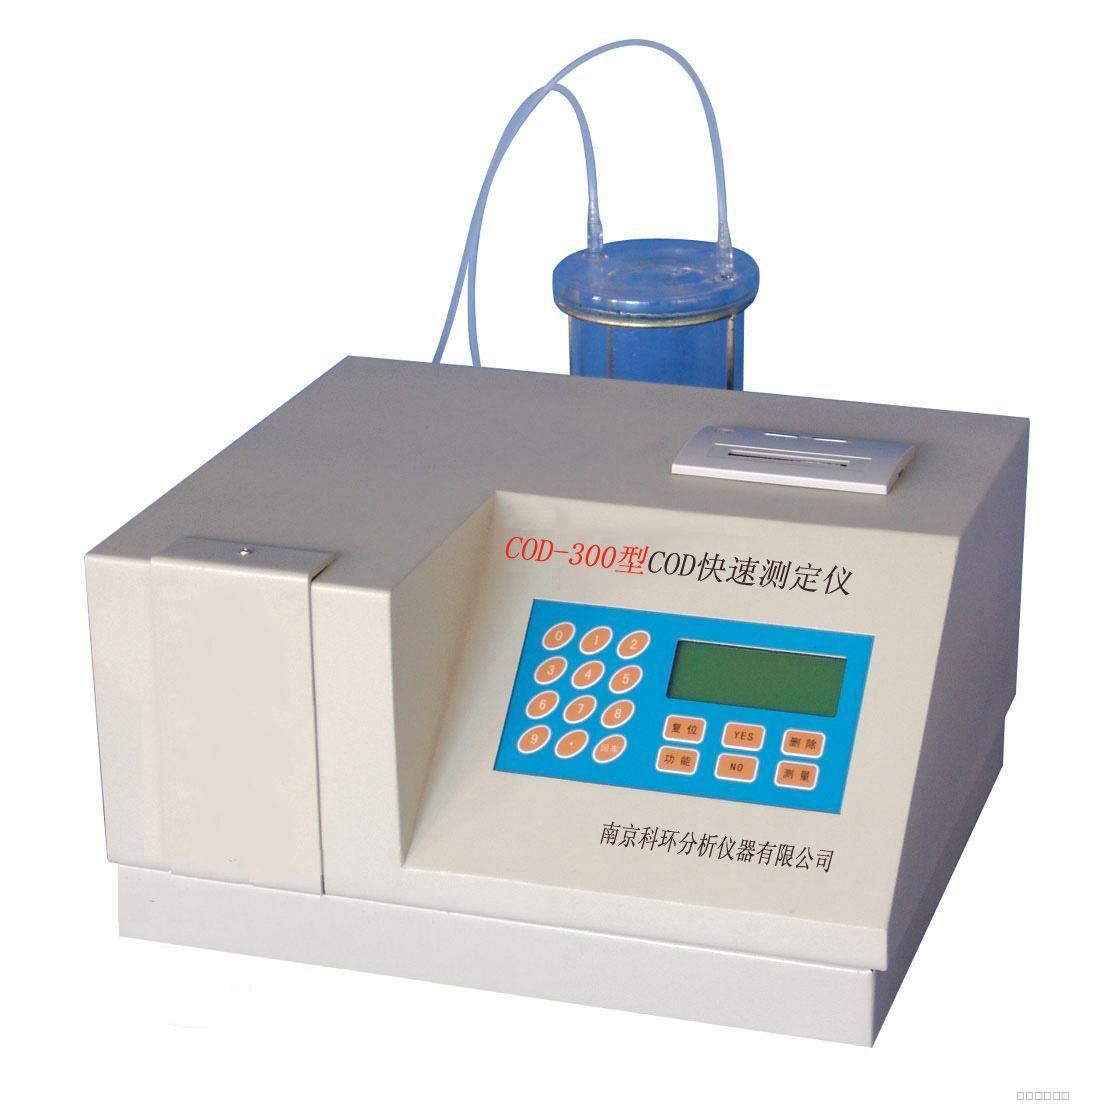 COD-300型COD快速测定仪